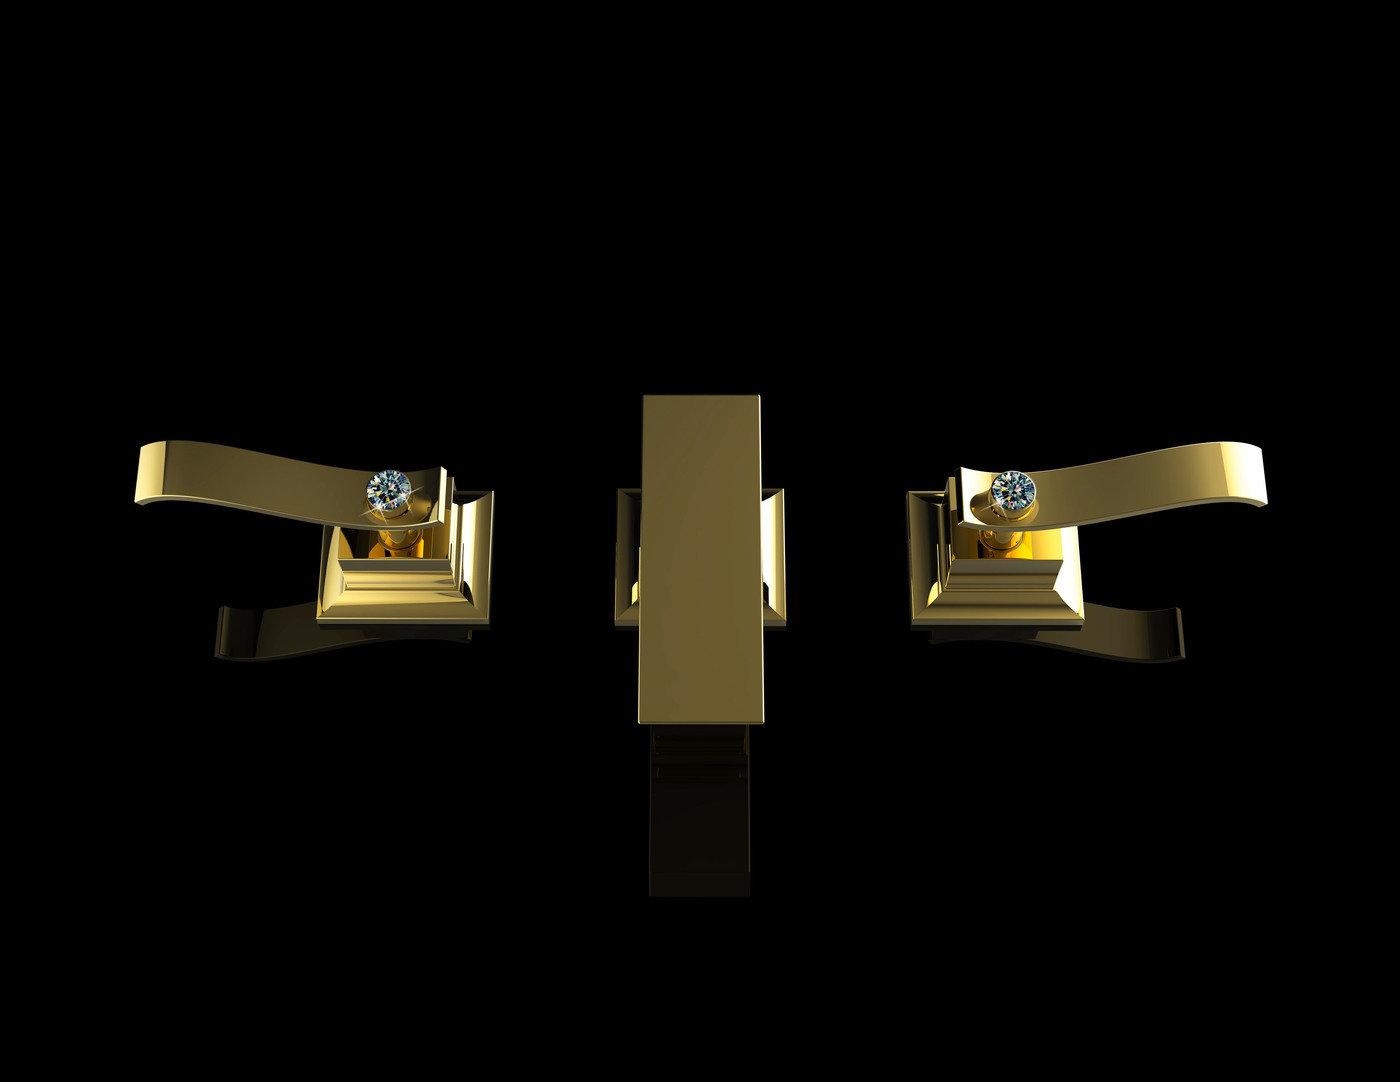 Faucet Design by Carolina Zhang at Coroflot.com